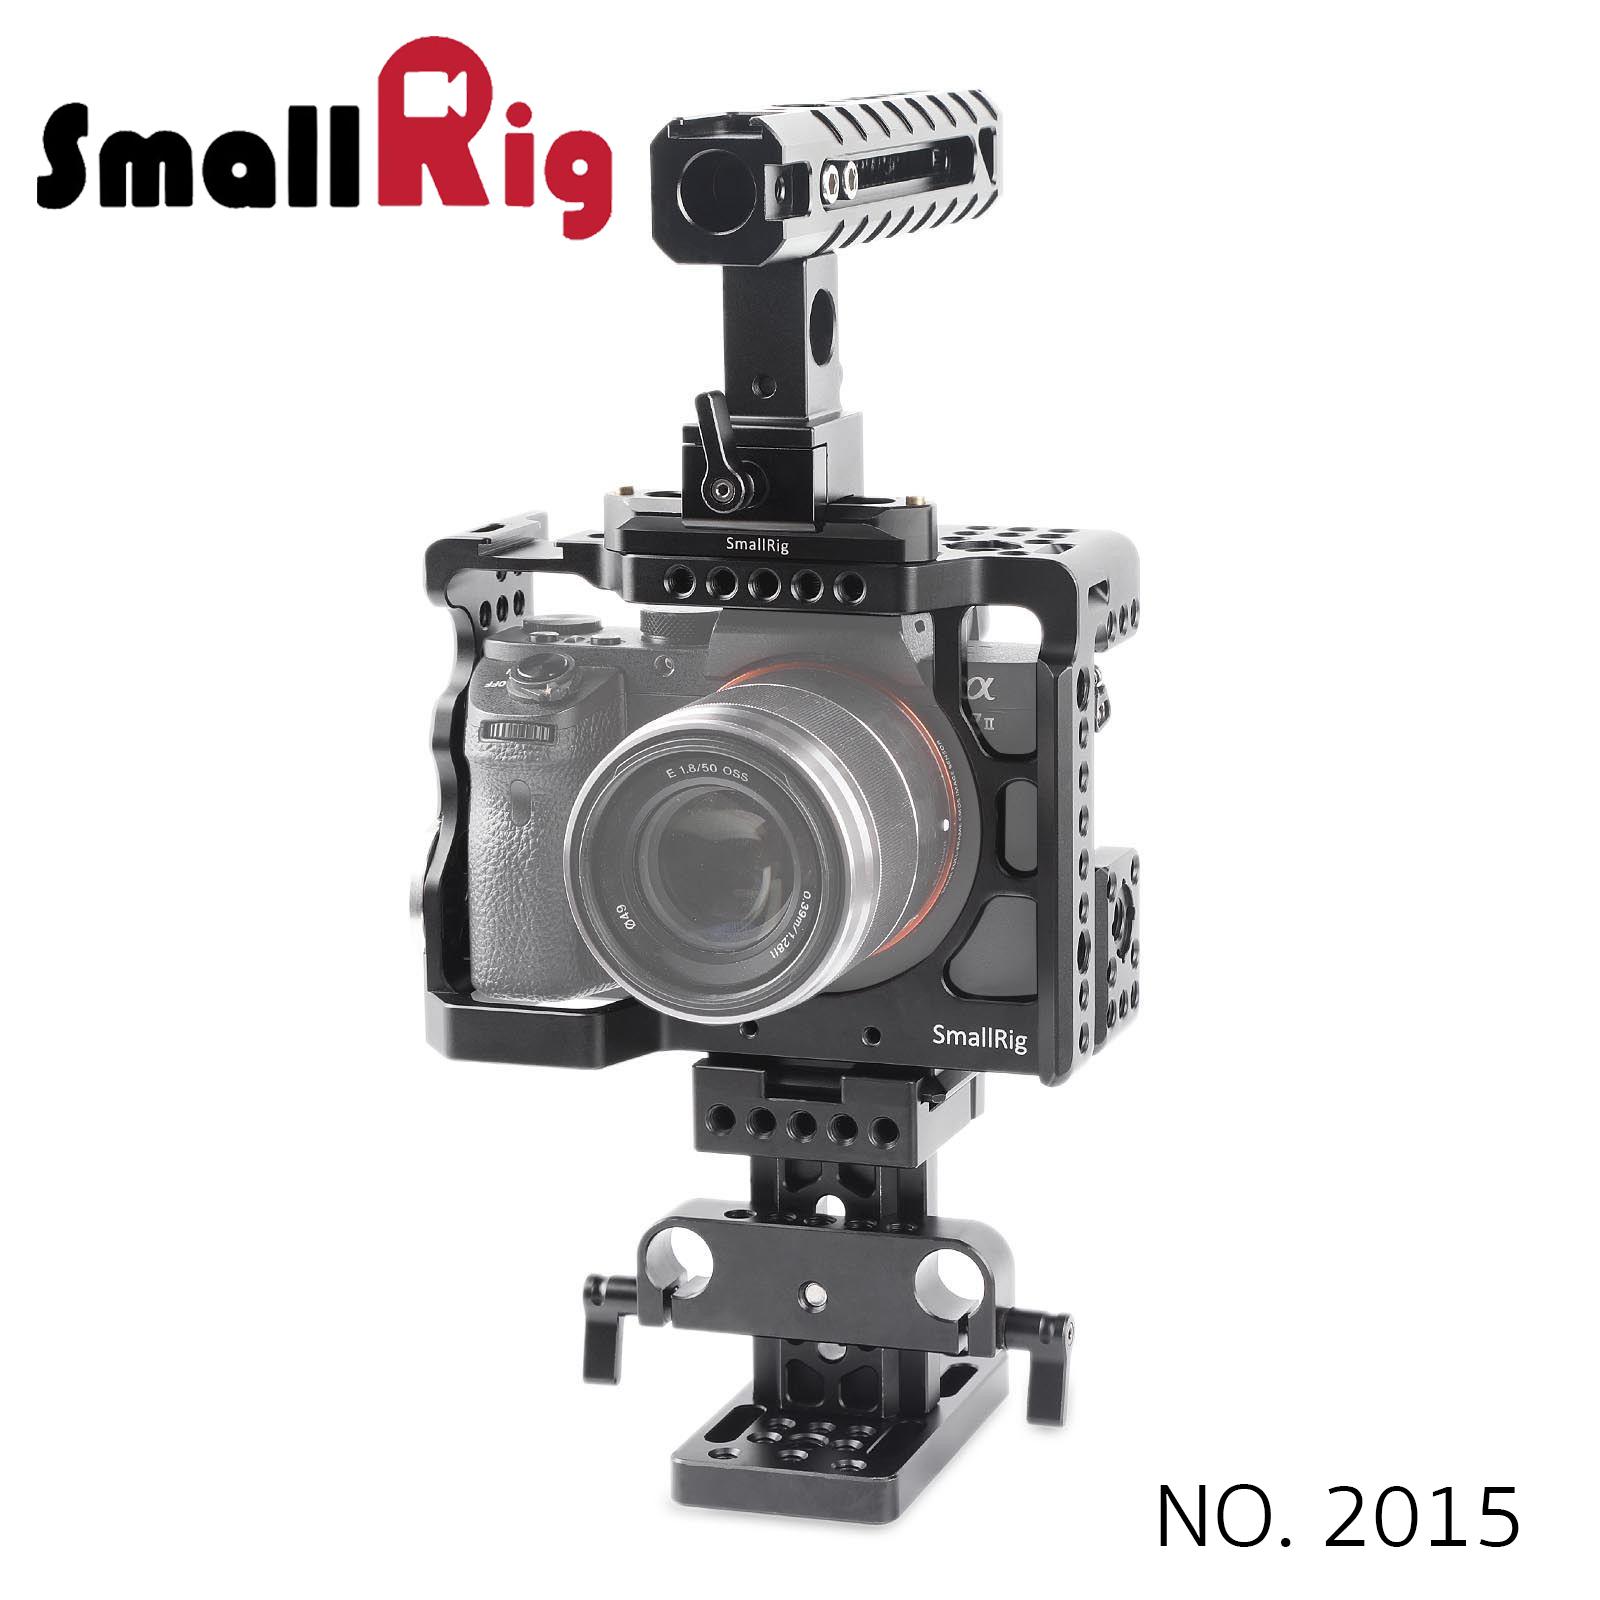 SMALLRIG® Sony A7 II/ A7R II/ A7S II Accessory Kit 2015